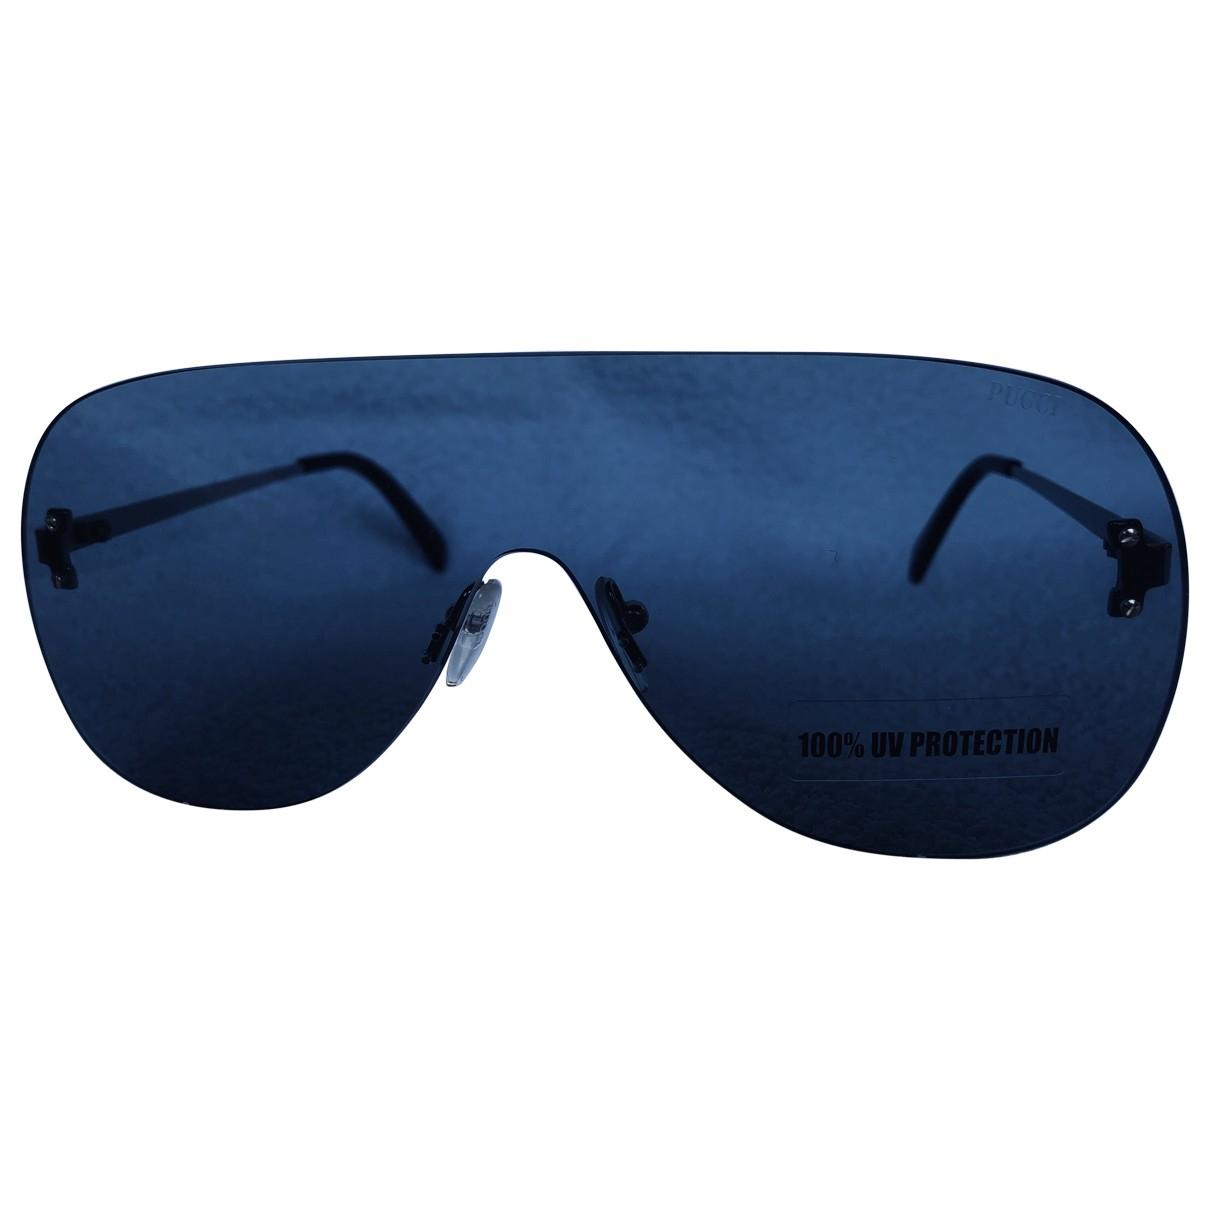 Emilio Pucci \N Blue Sunglasses for Women \N